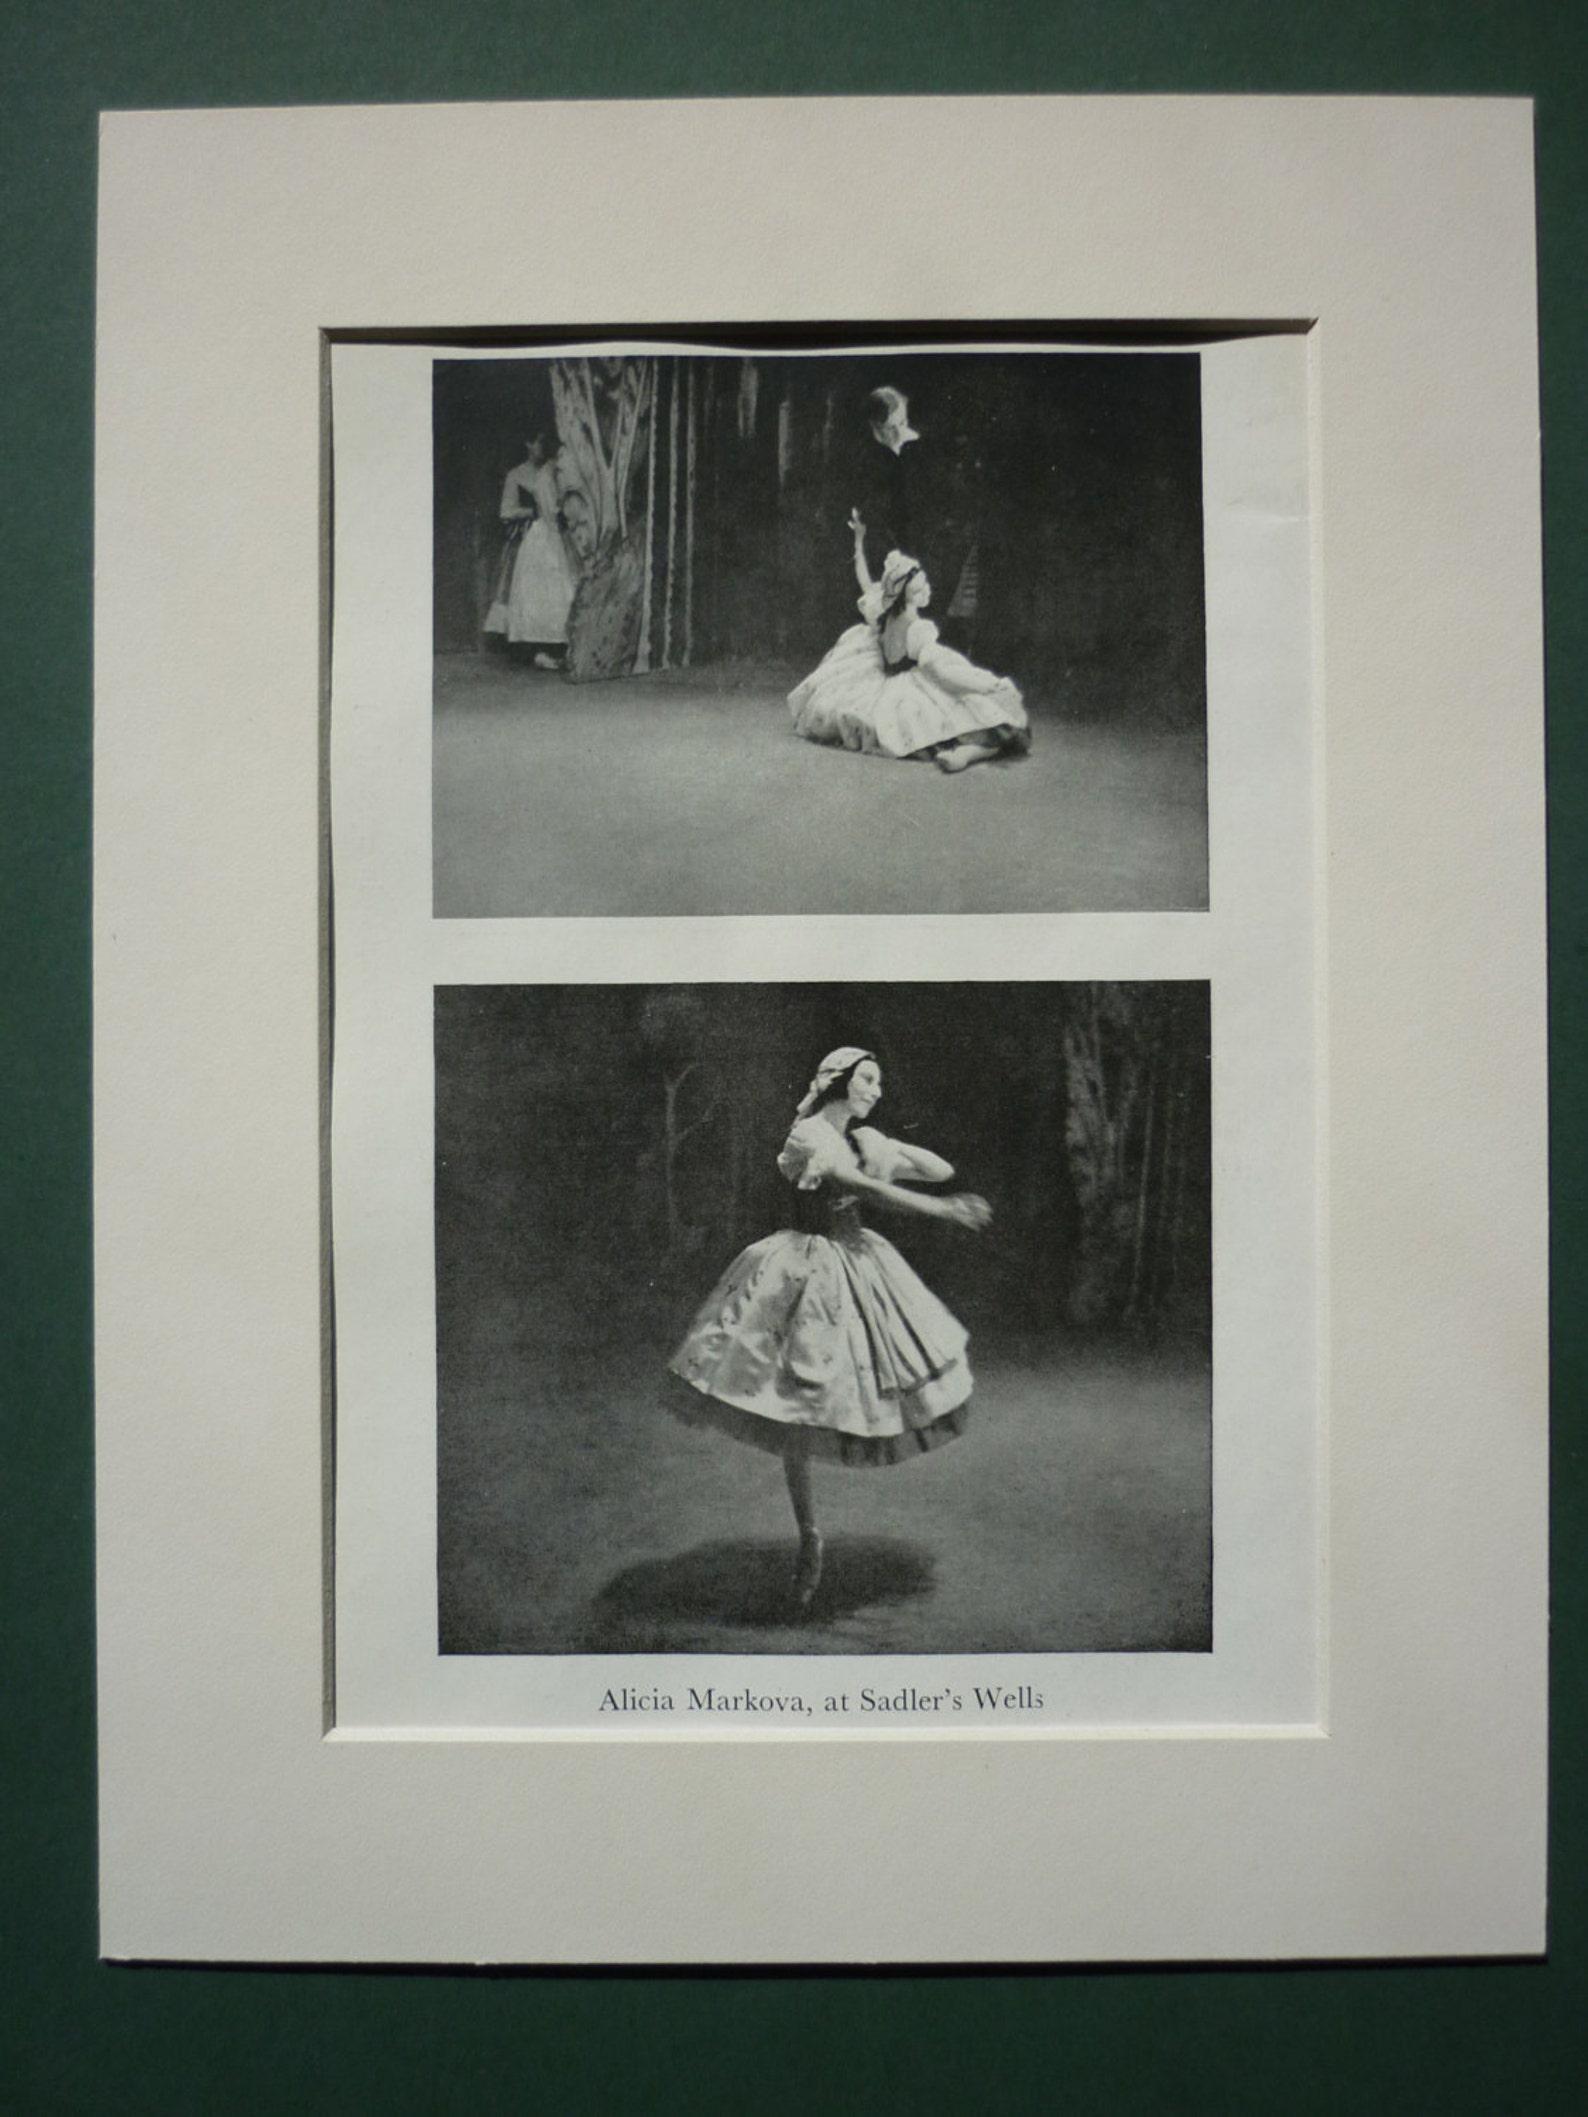 vintage 1946 ballet dancer print - ballerina - sadlers wells theatre - ballet studio - technique - alicia markova - dance - danc